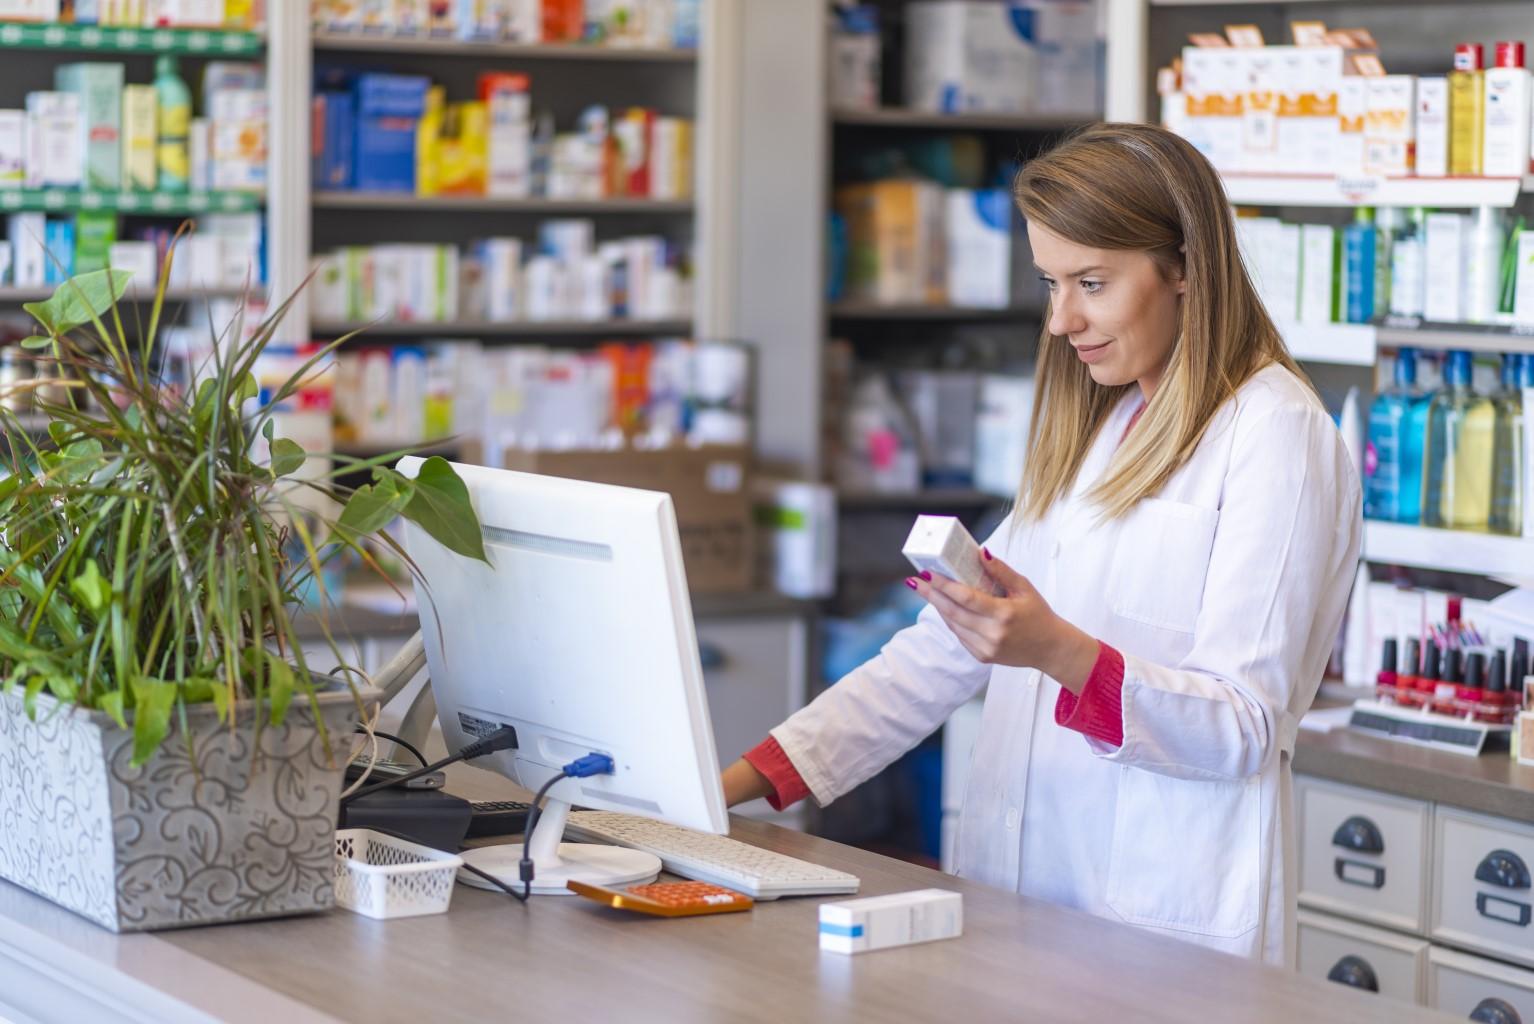 Pharmacist on a computer